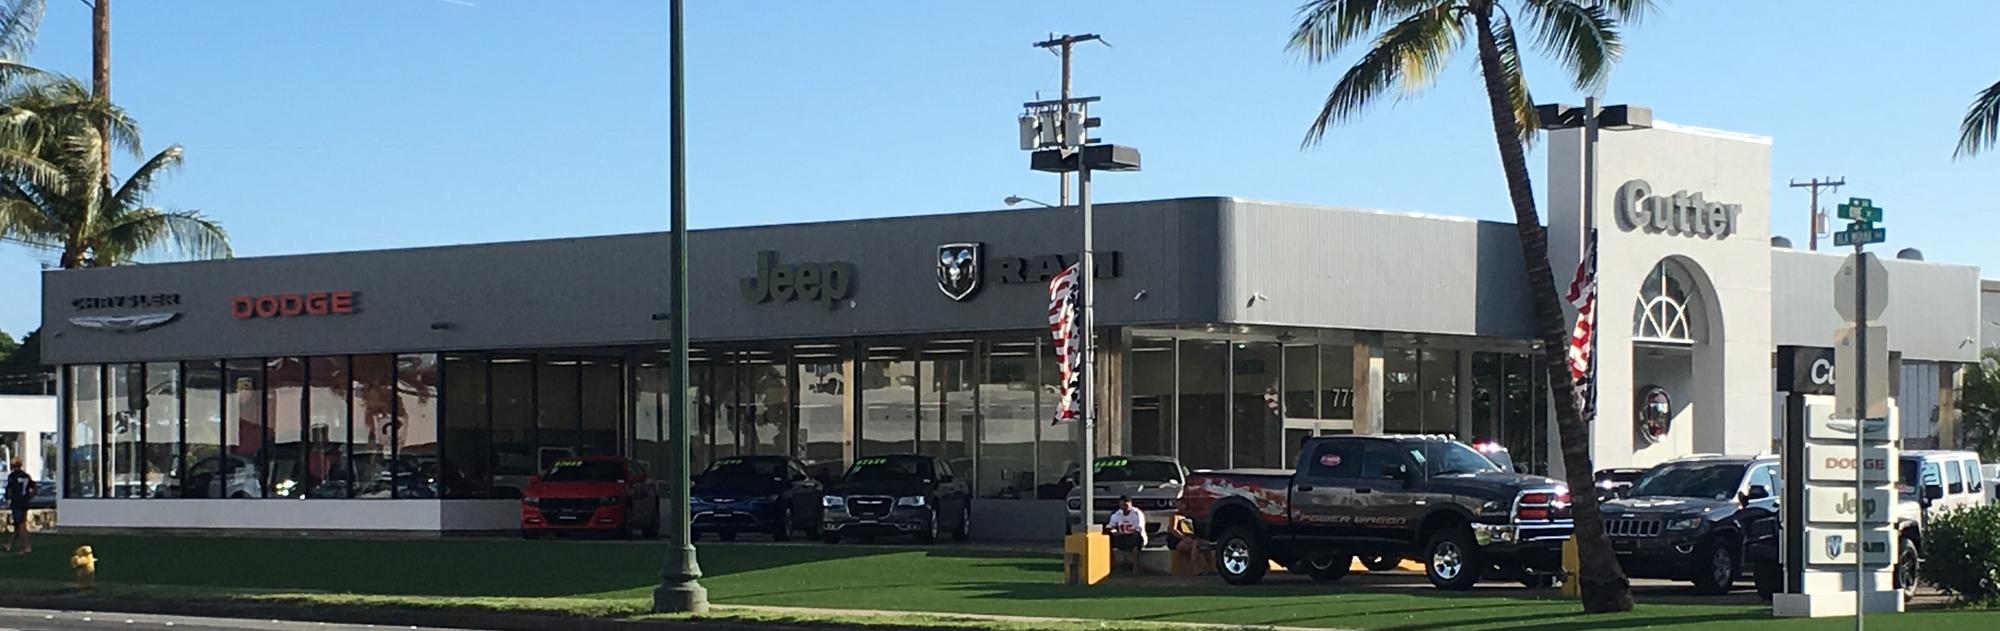 Cutter Chrysler Jeep Dodge Of Honolulu